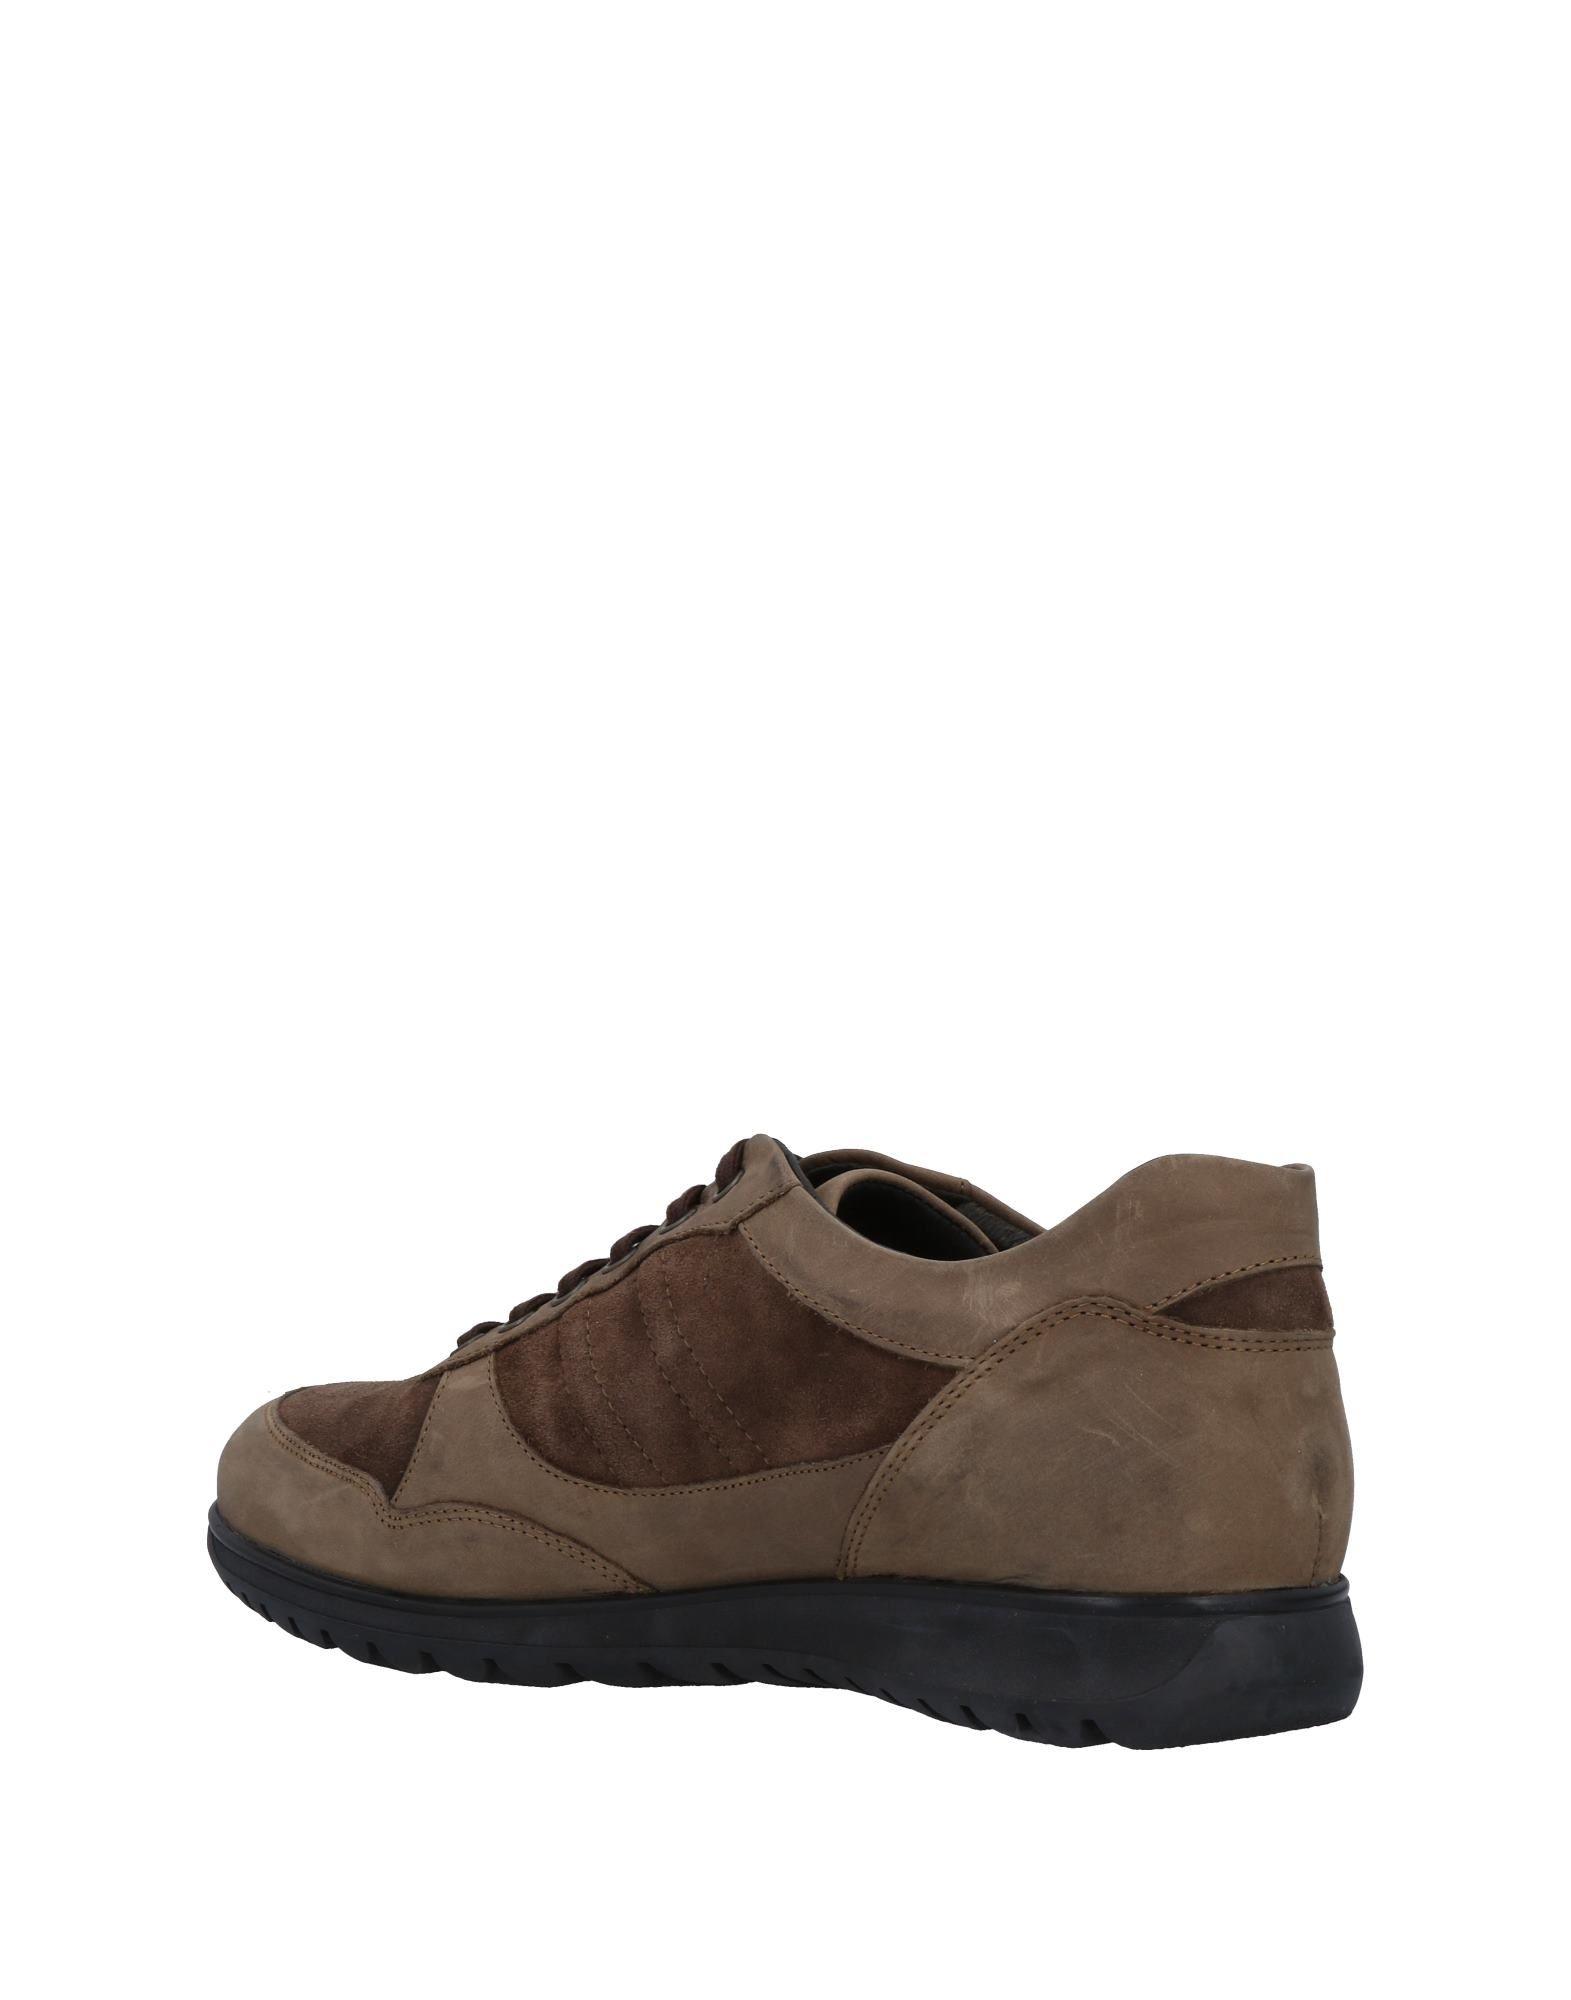 Grünland Grünland  Sneakers Herren  11485095TR 25e3c3